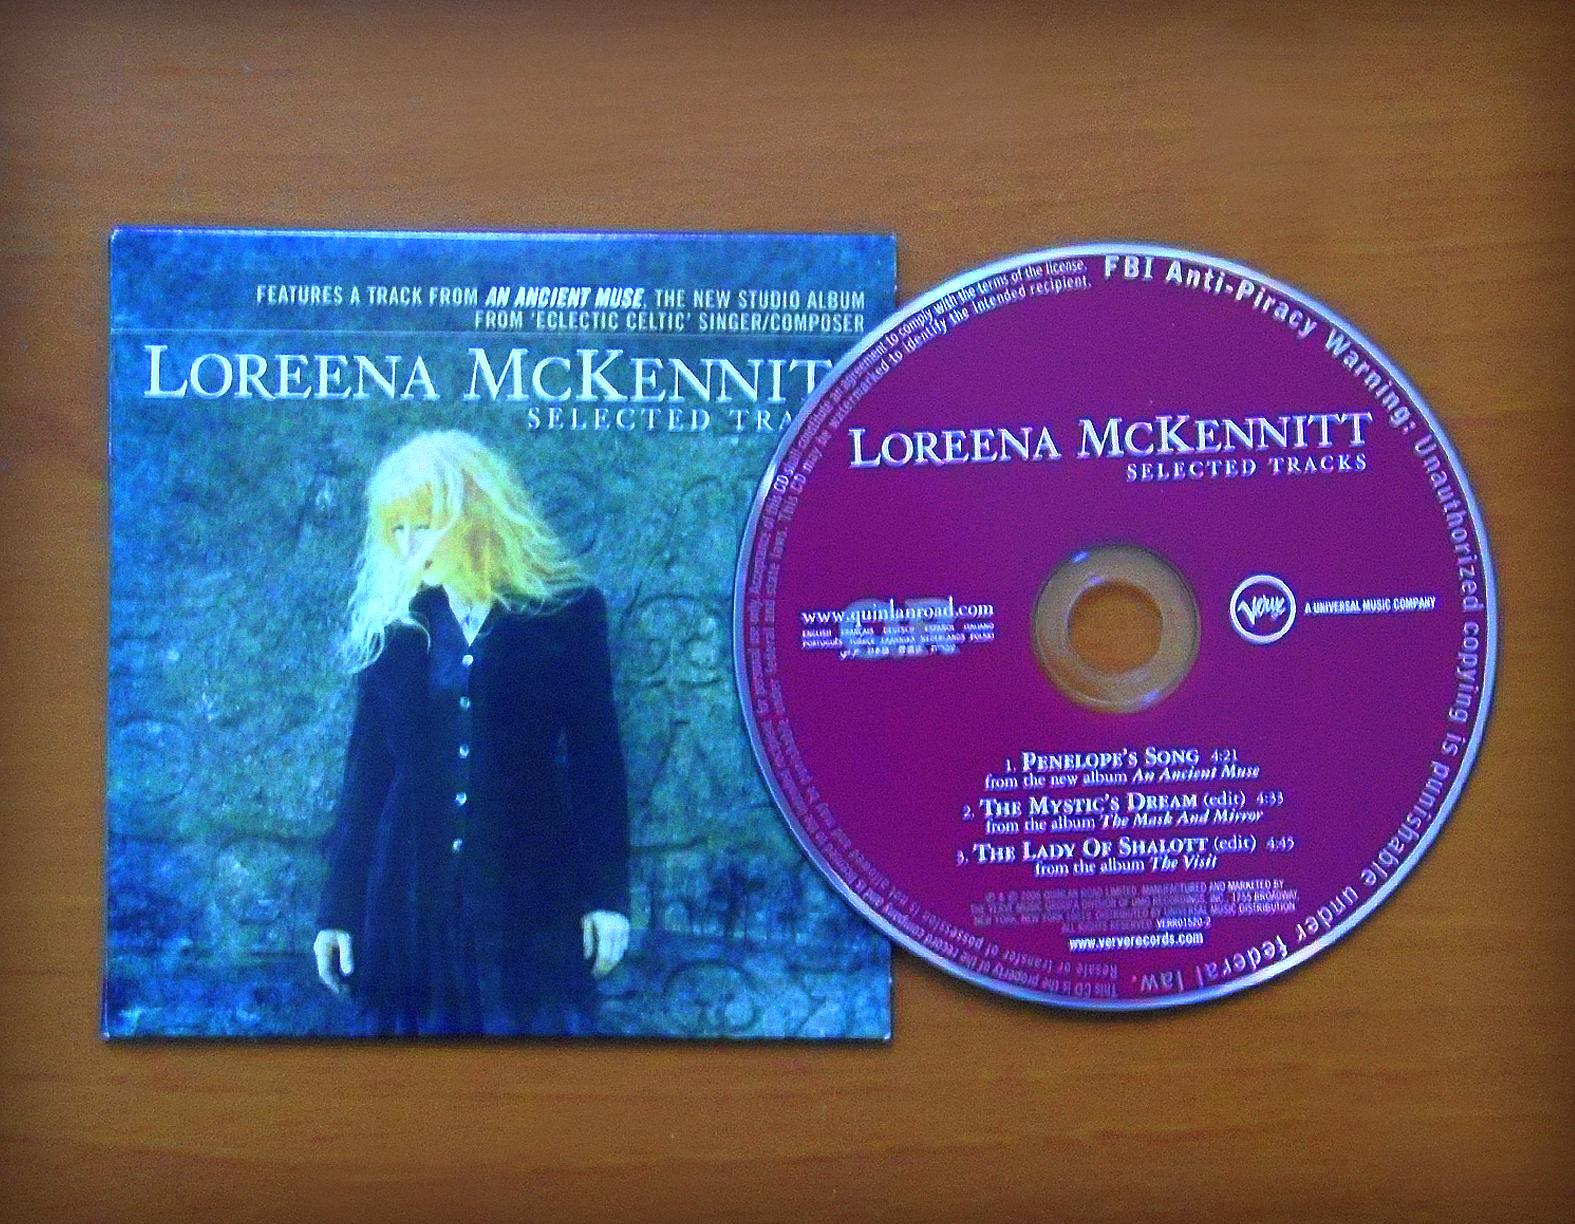 loreena mckennitt collection 2006 selected tracks